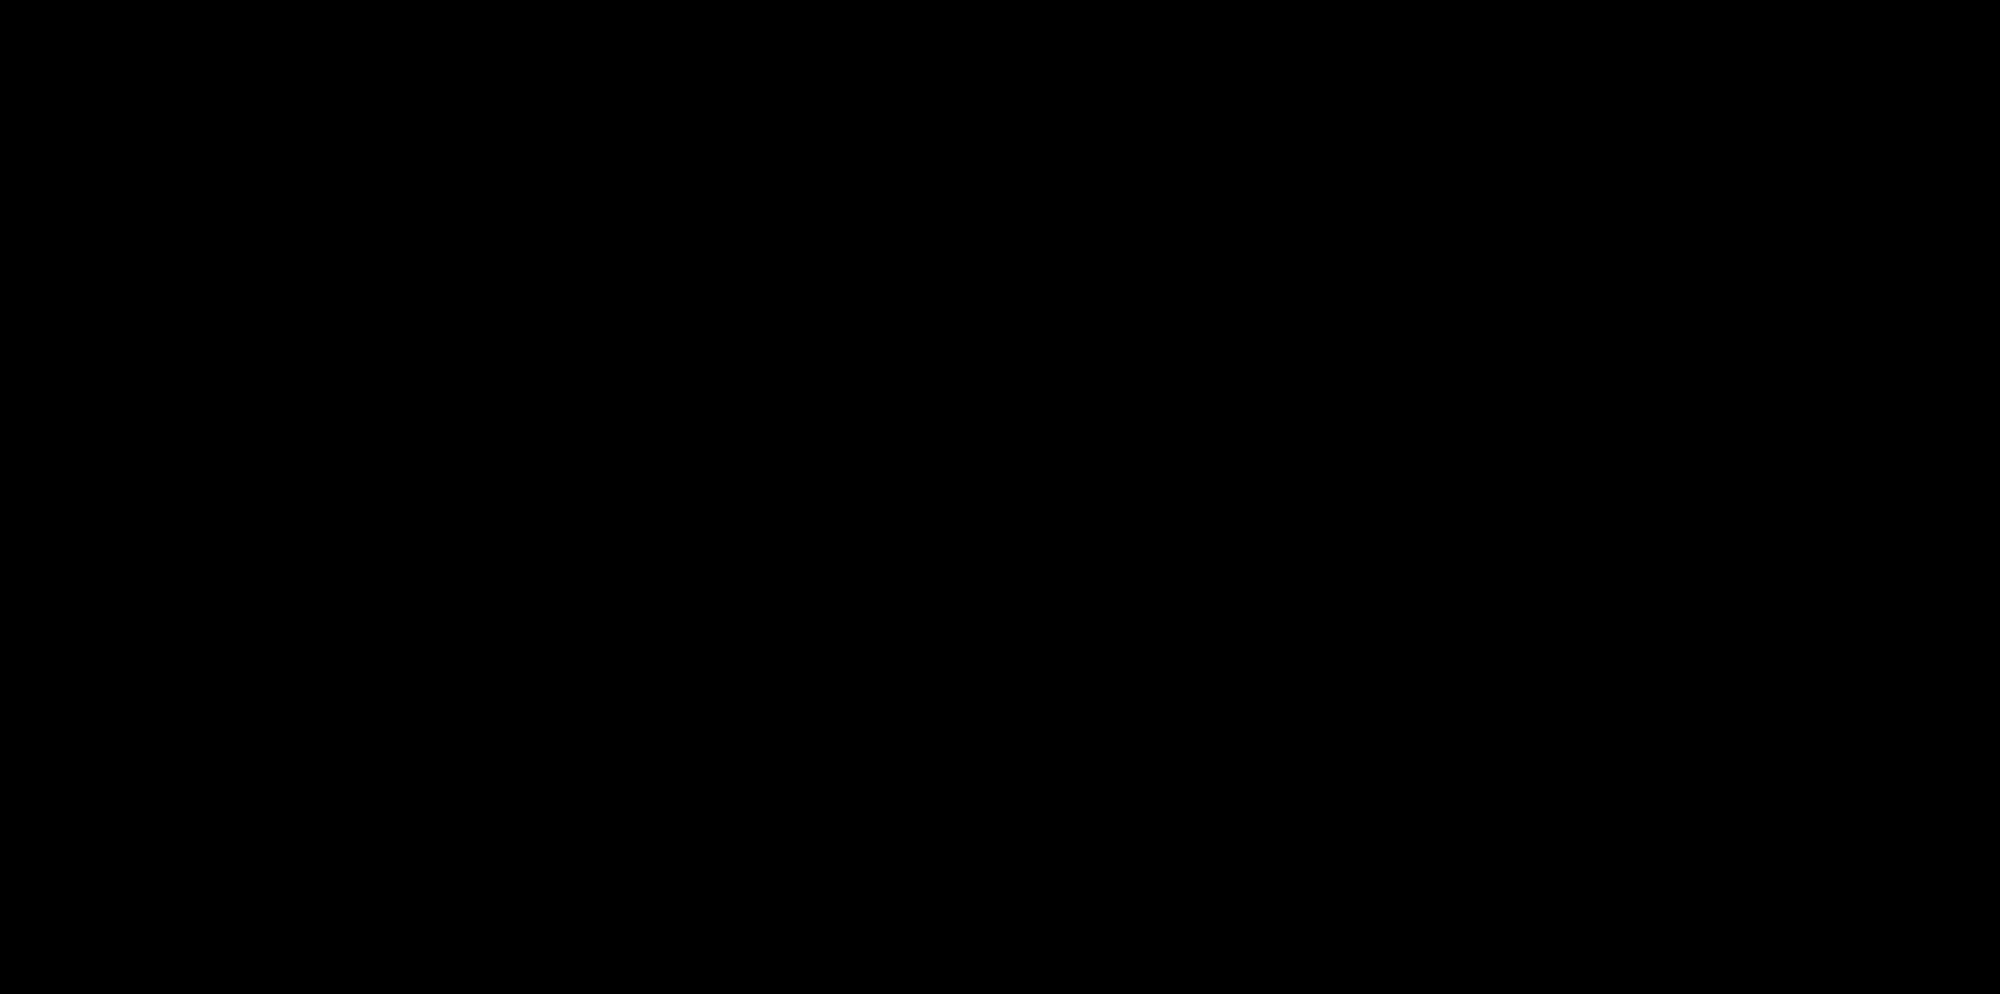 TARANTELLA-logo.png